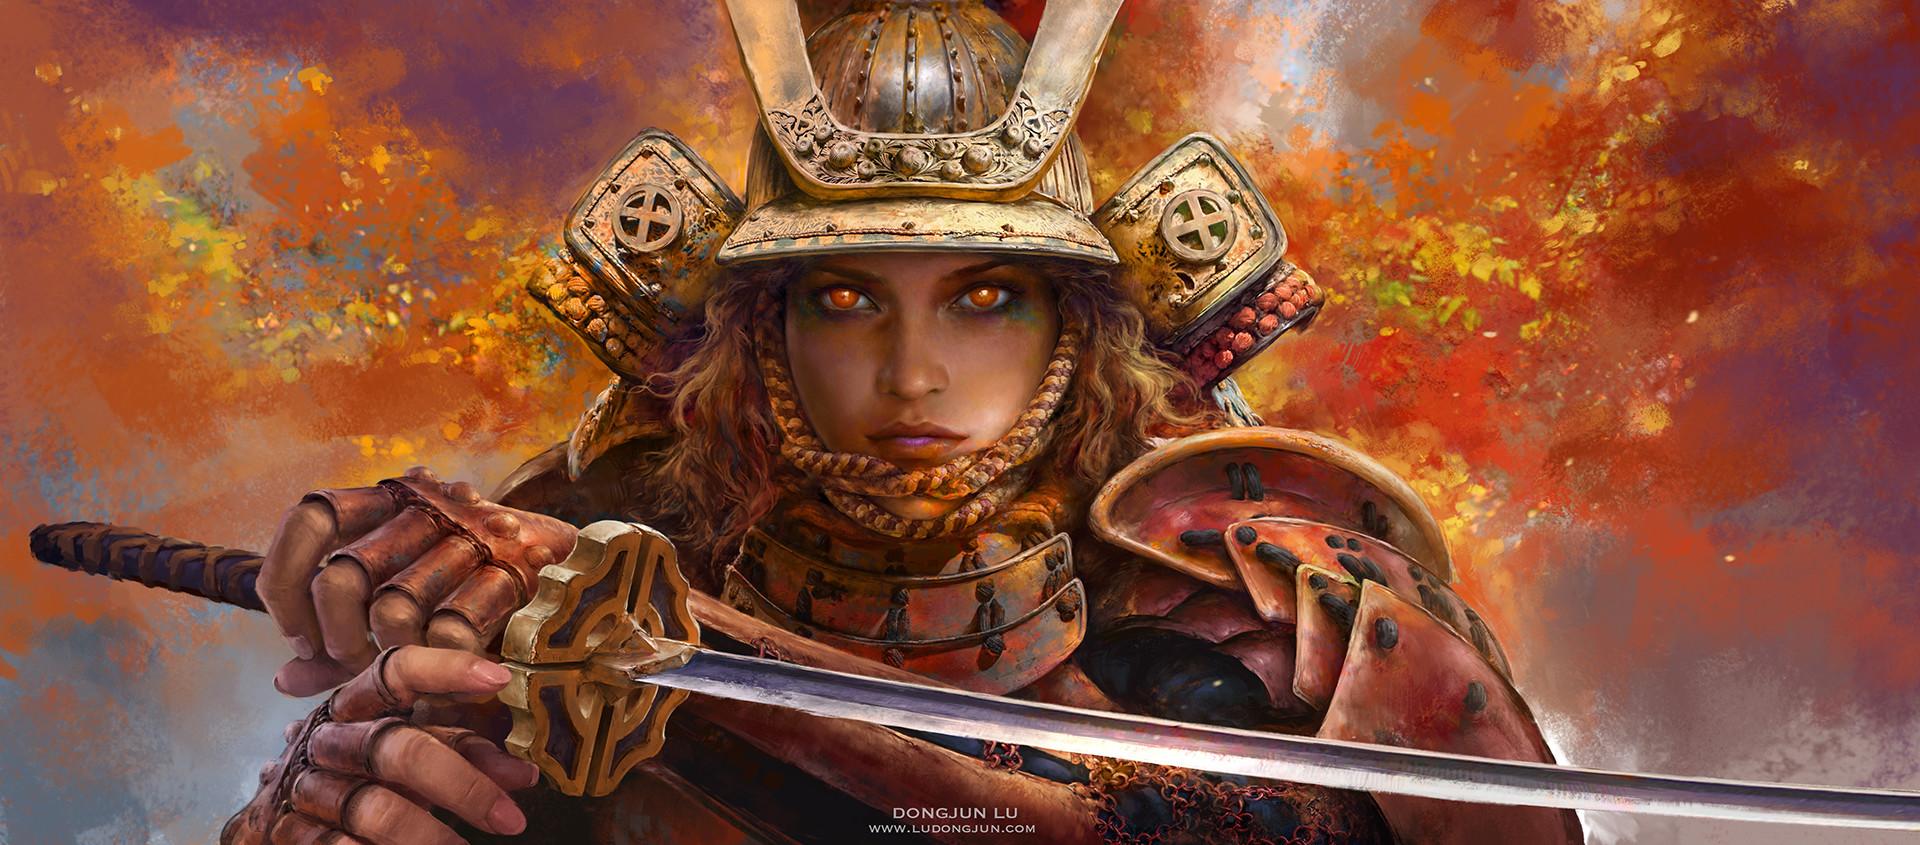 1080p Girl Wallpaper Artstation Samurai Girl Russell Dongjun Lu